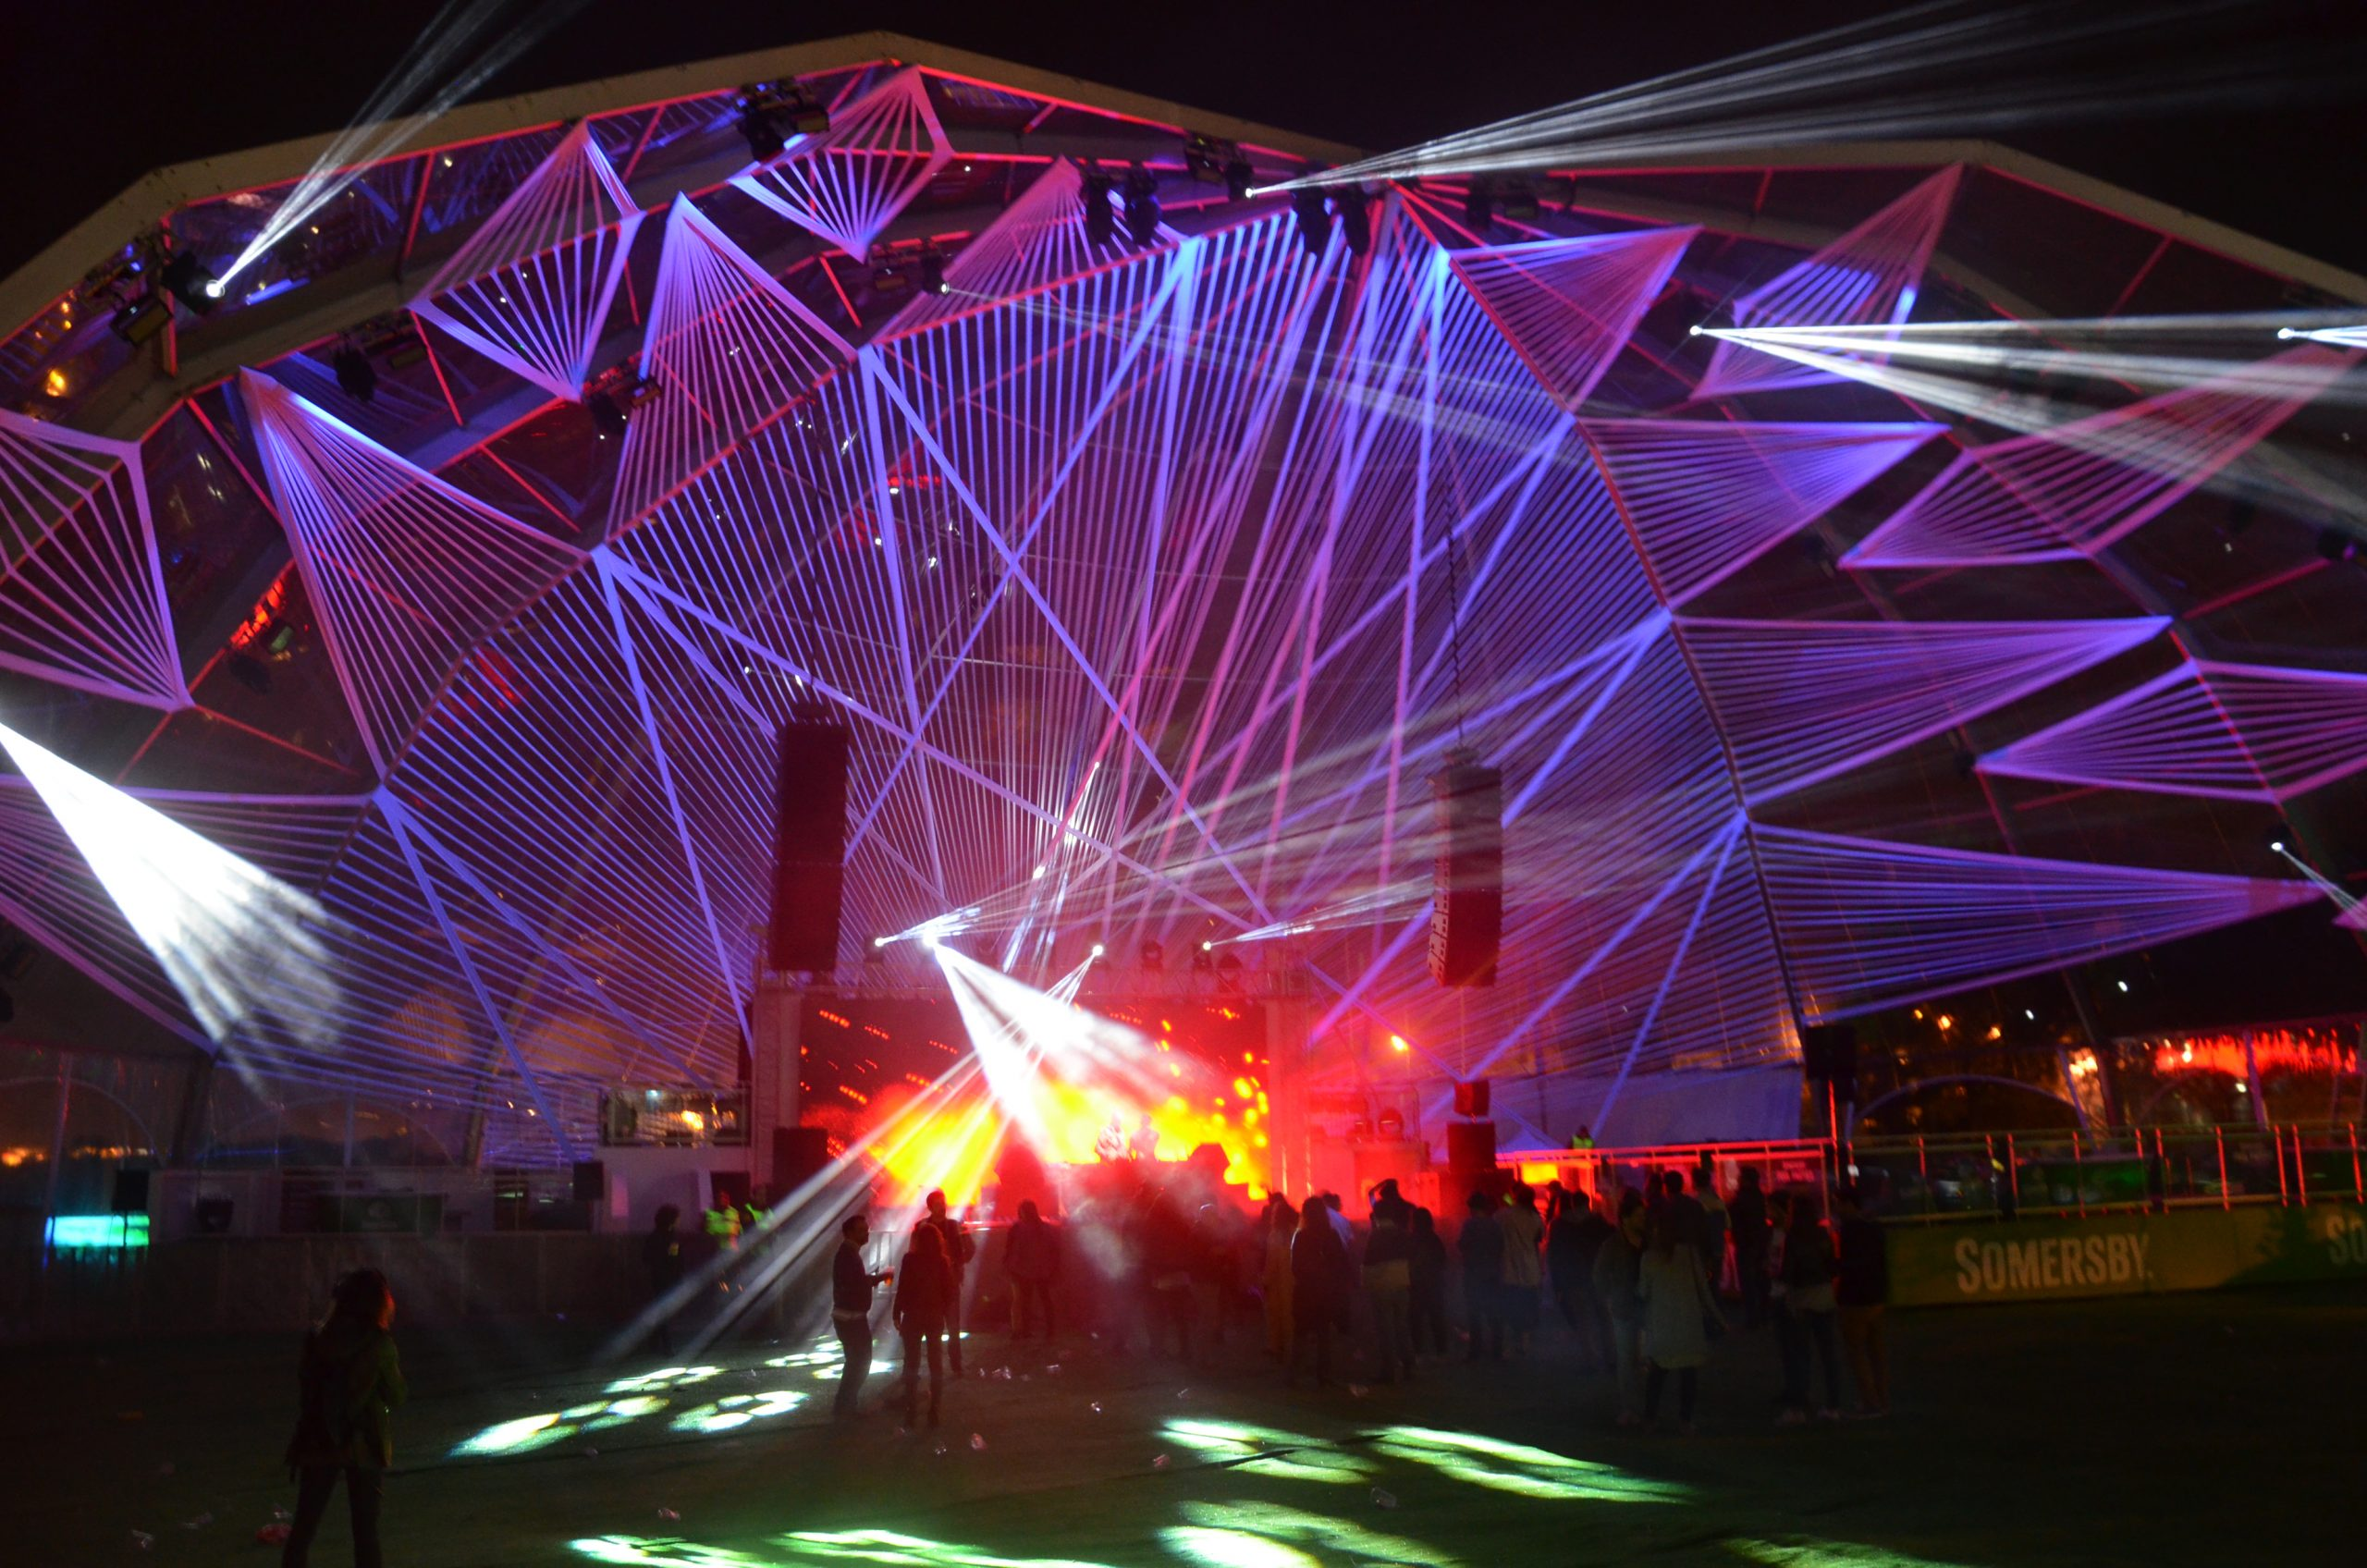 Tenda Electronica – Rock in Rio 2016